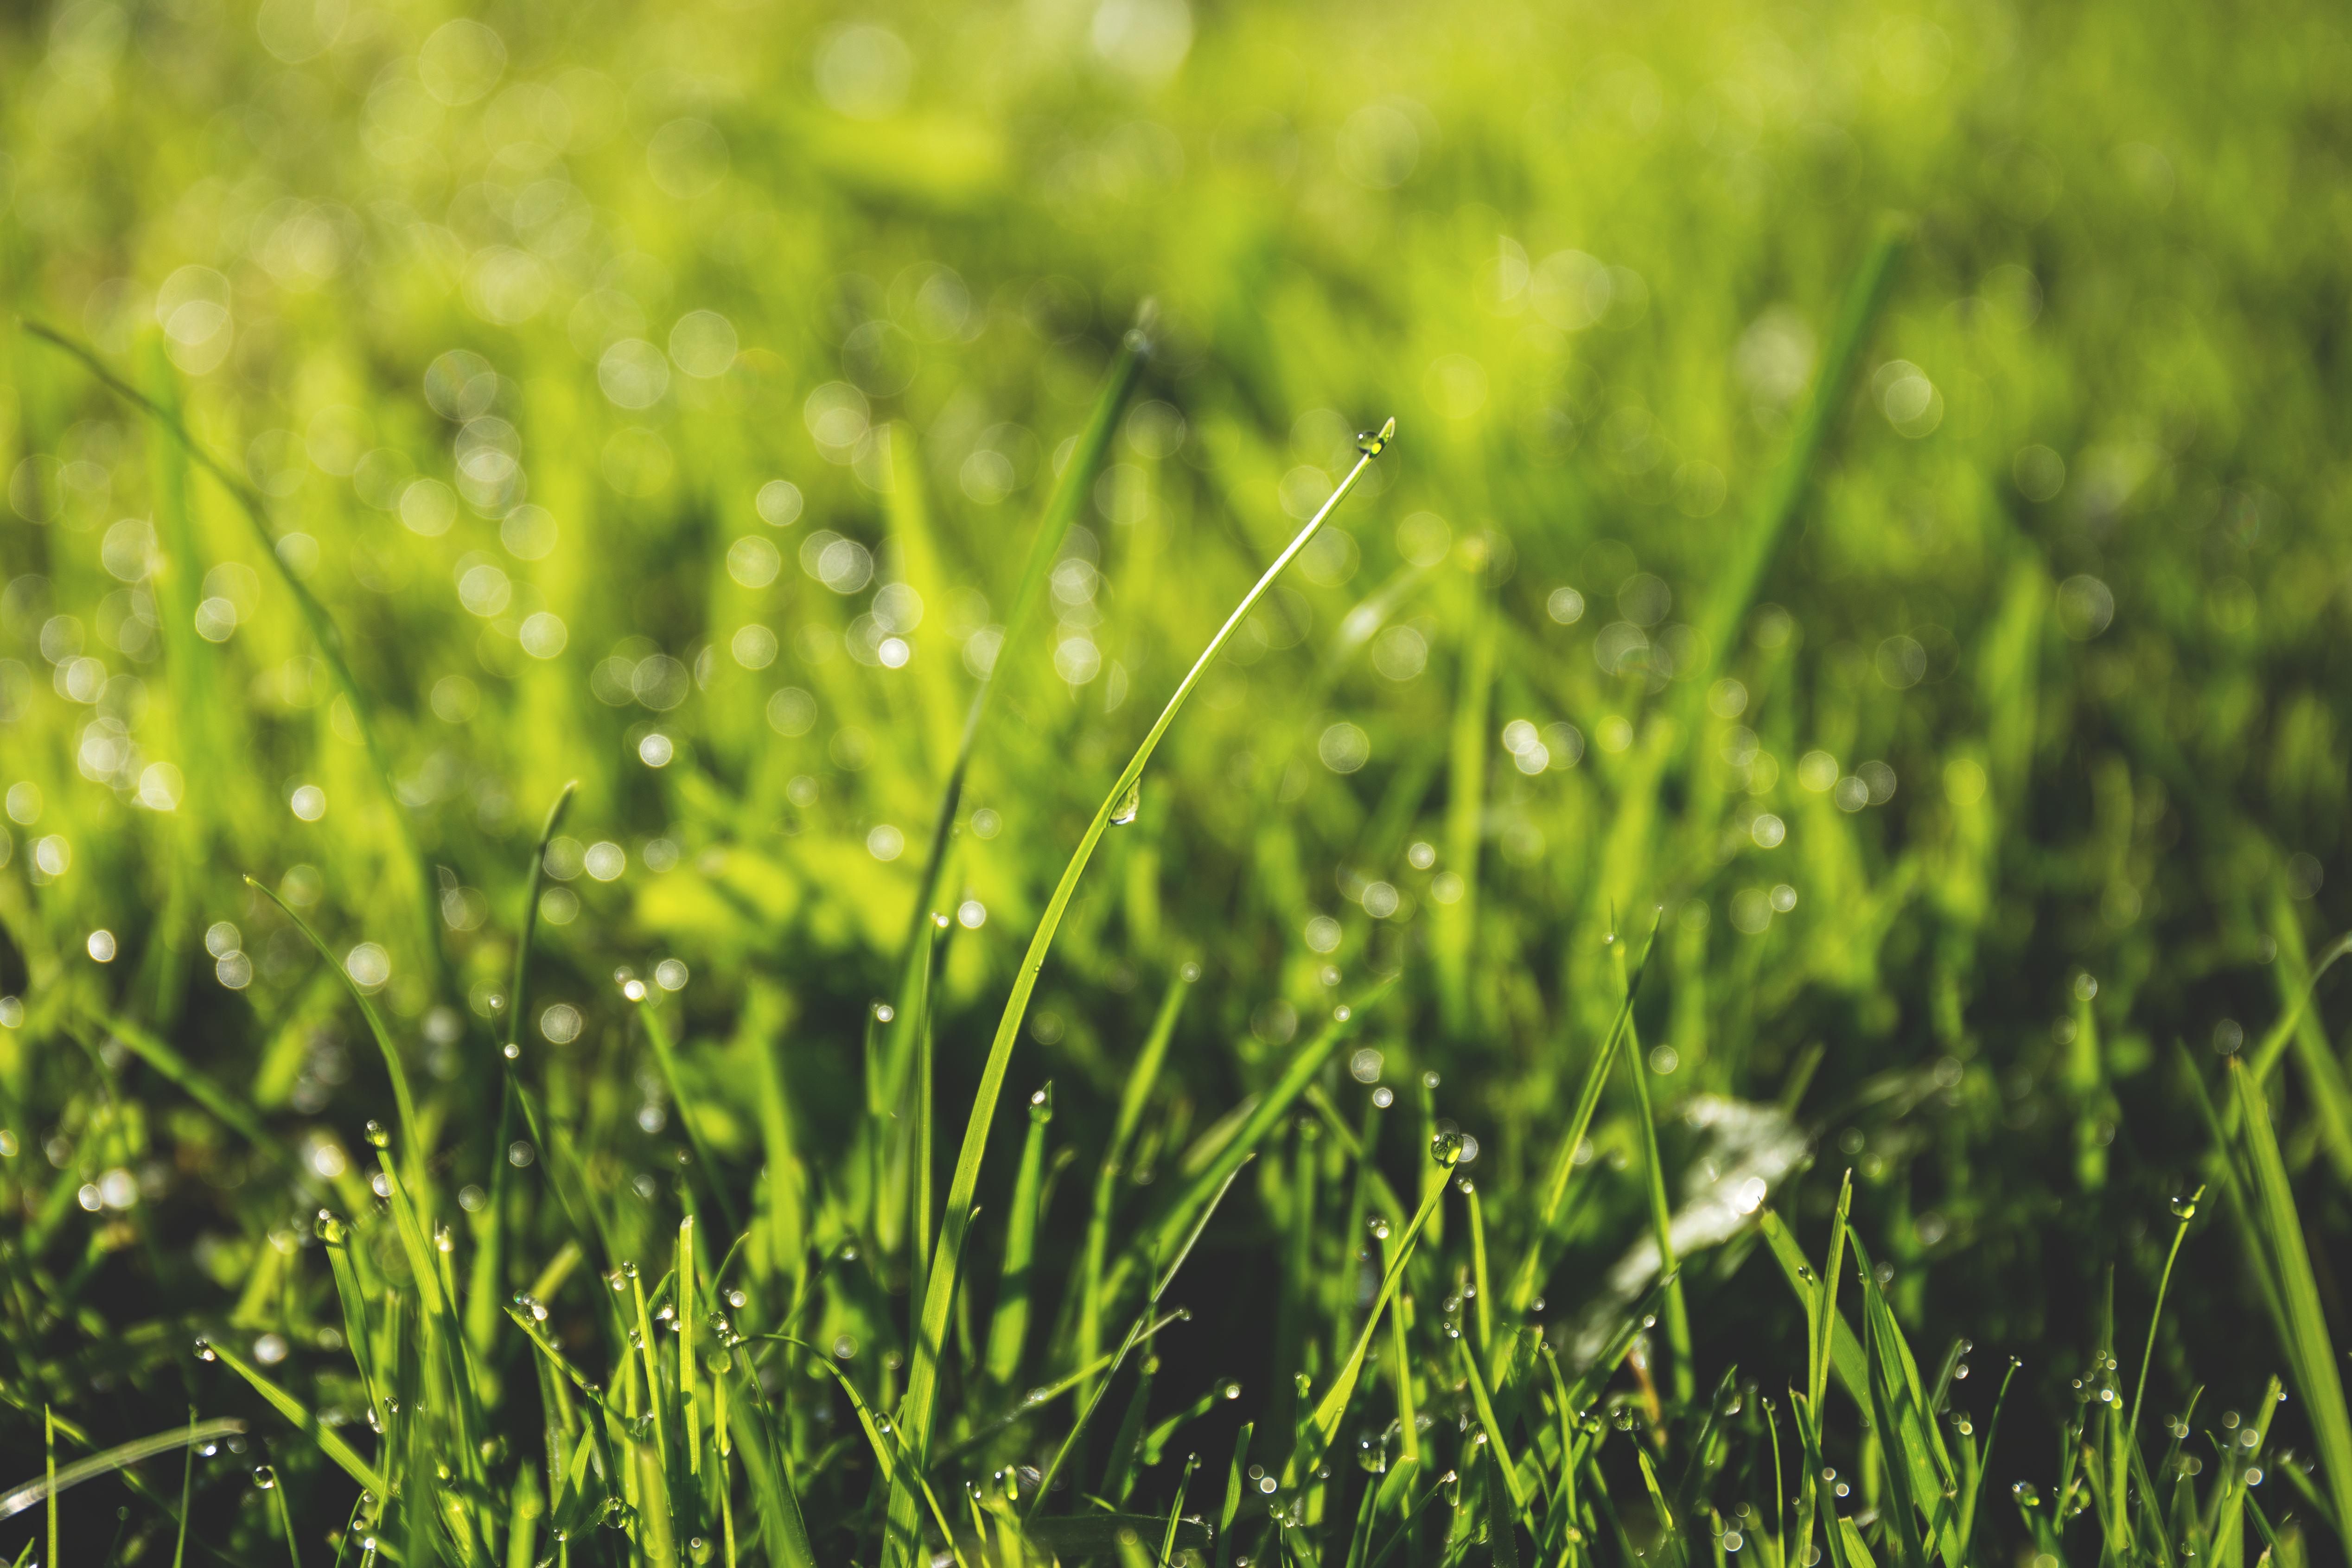 grass macro photography - photo #1